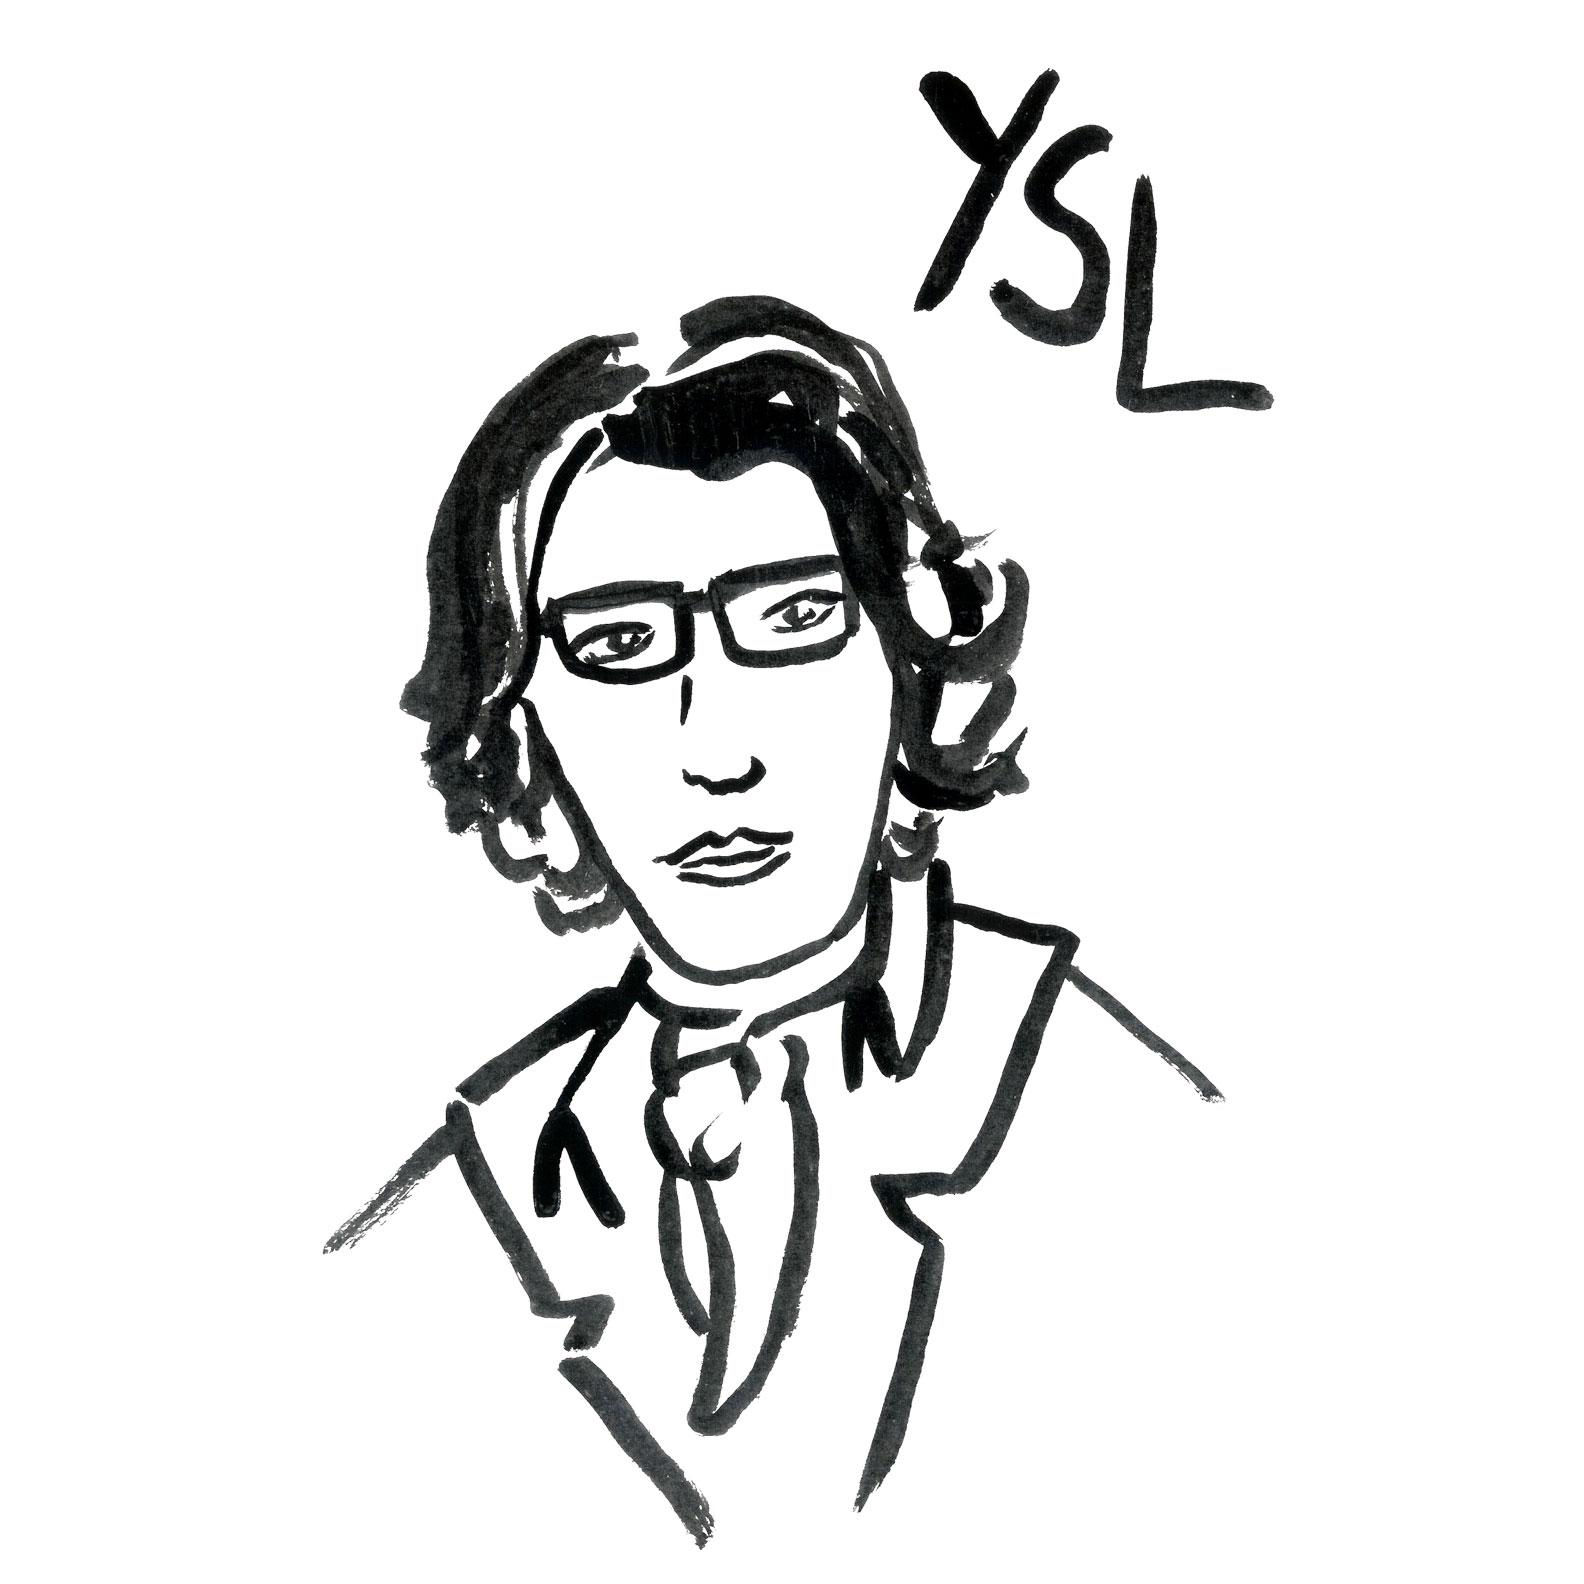 YSL illustration